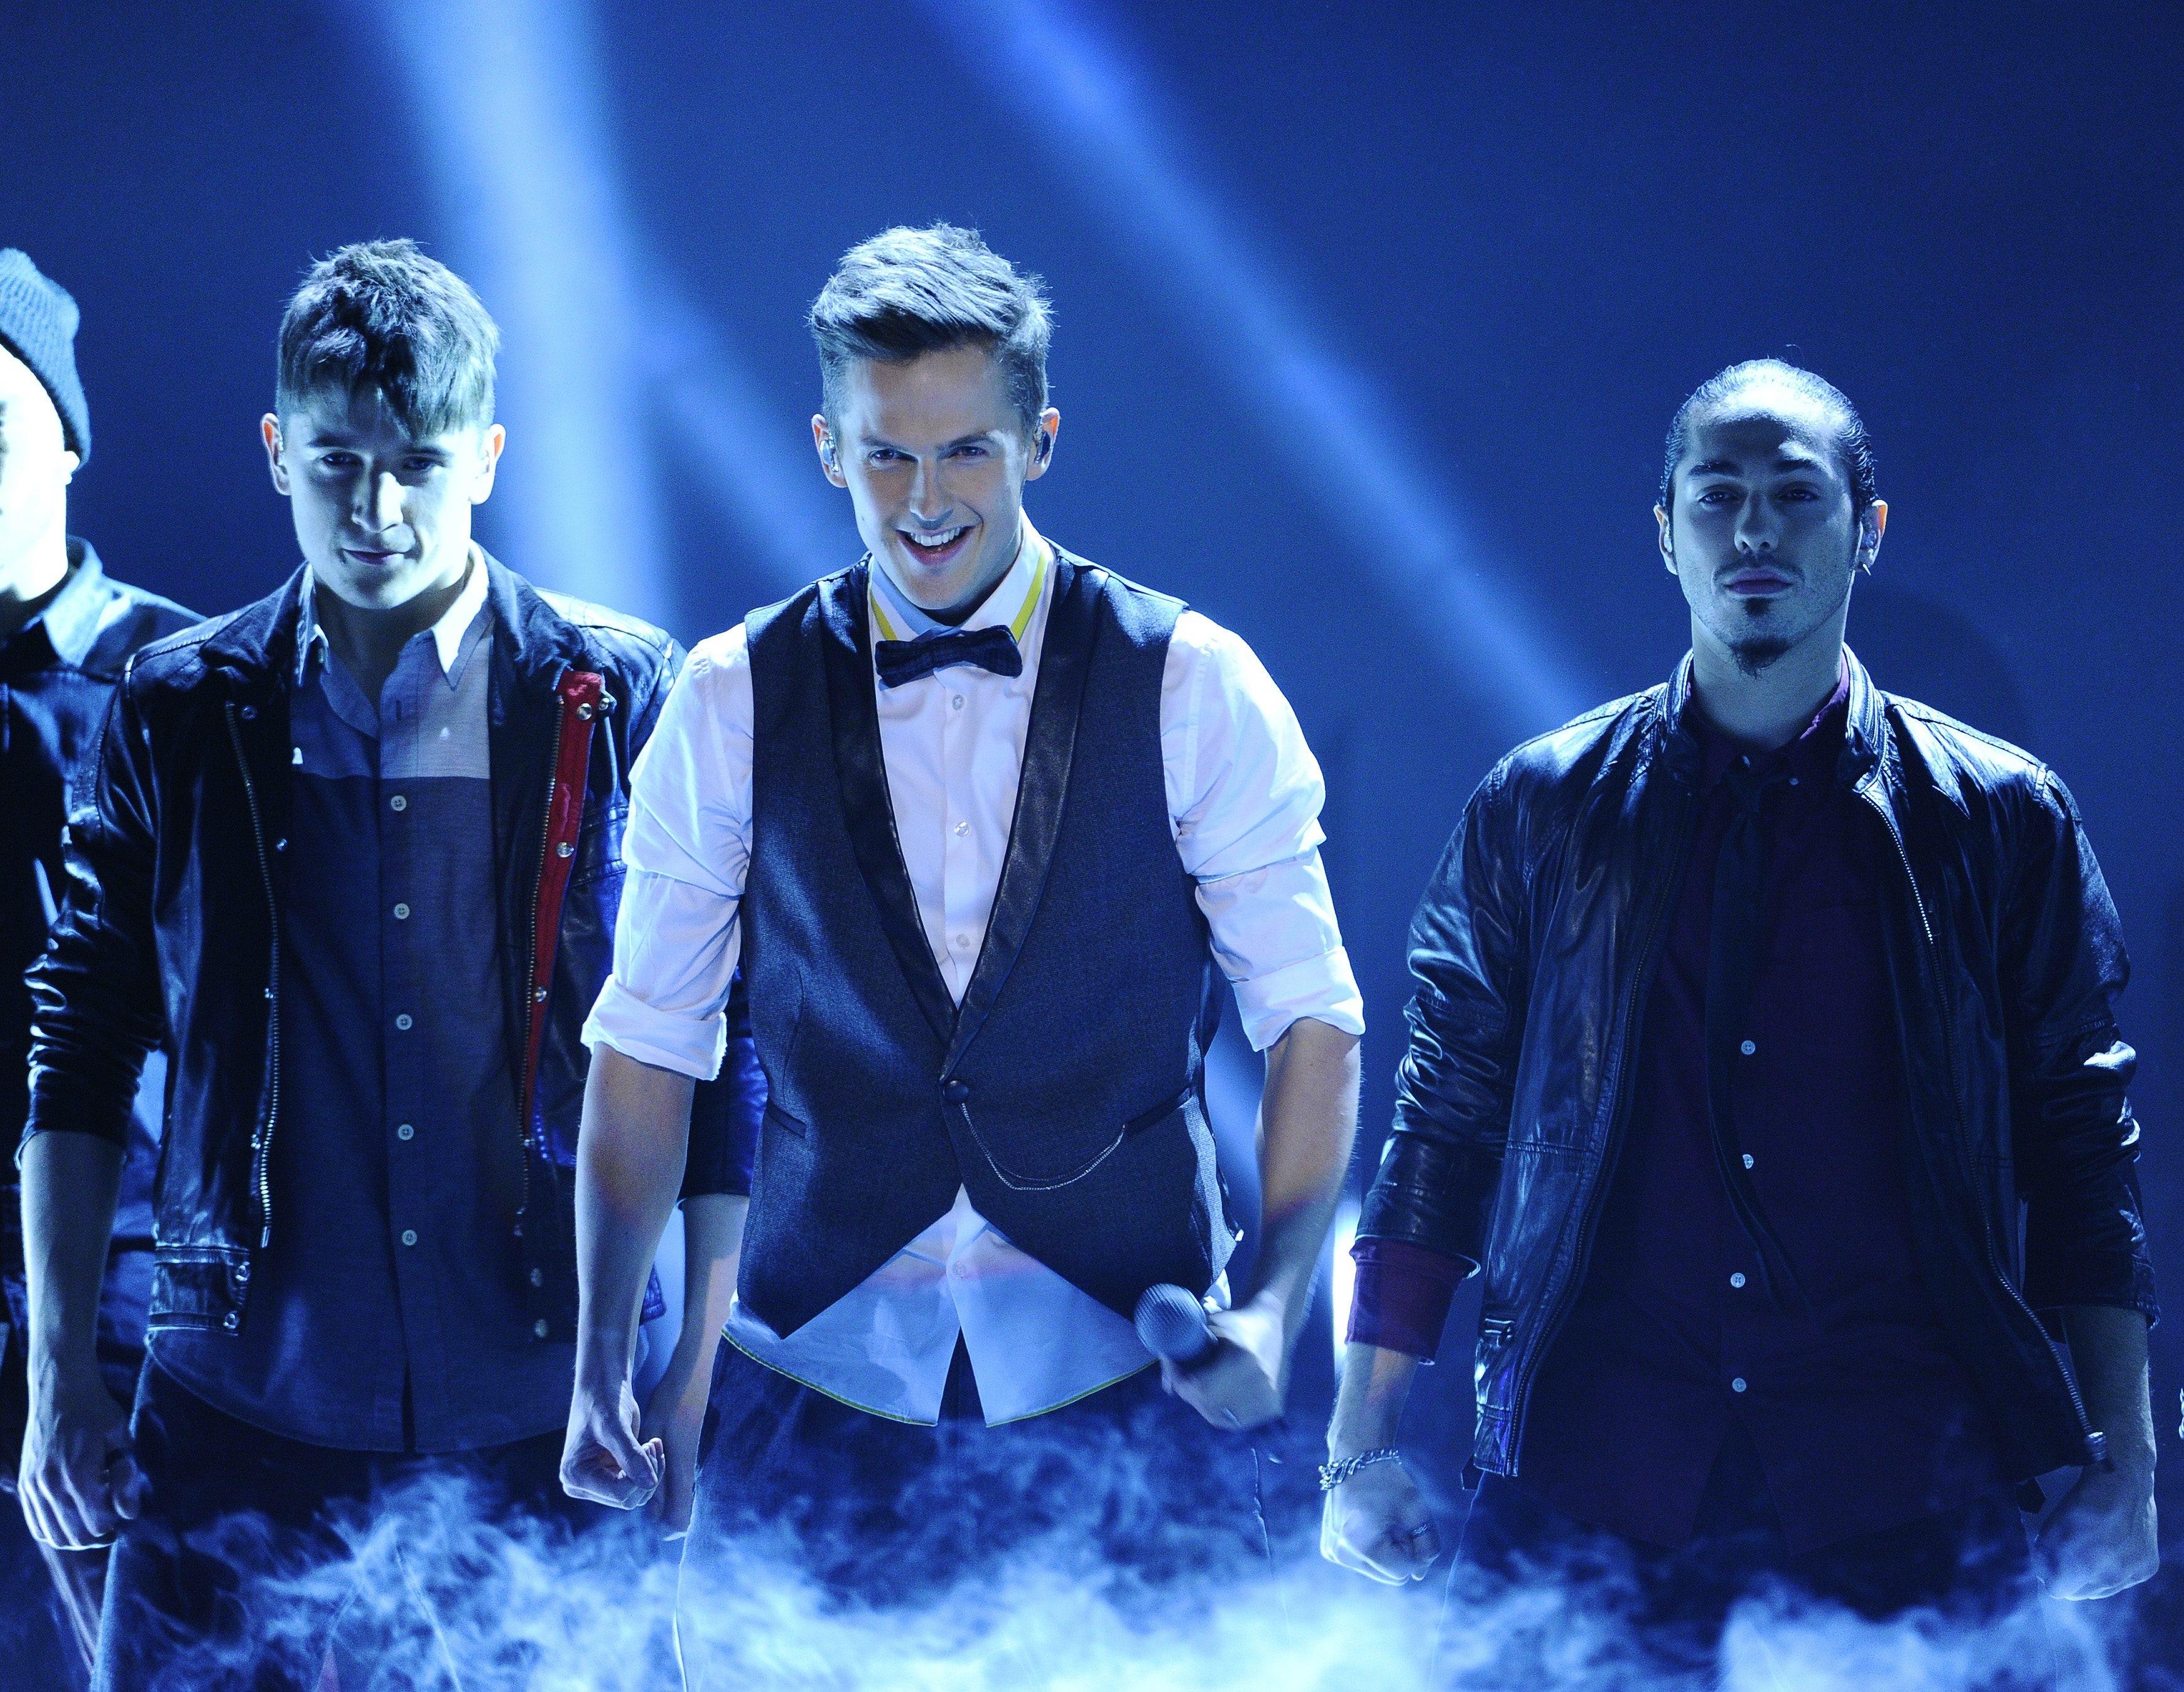 David Lindgren Melodifestivalen 2013